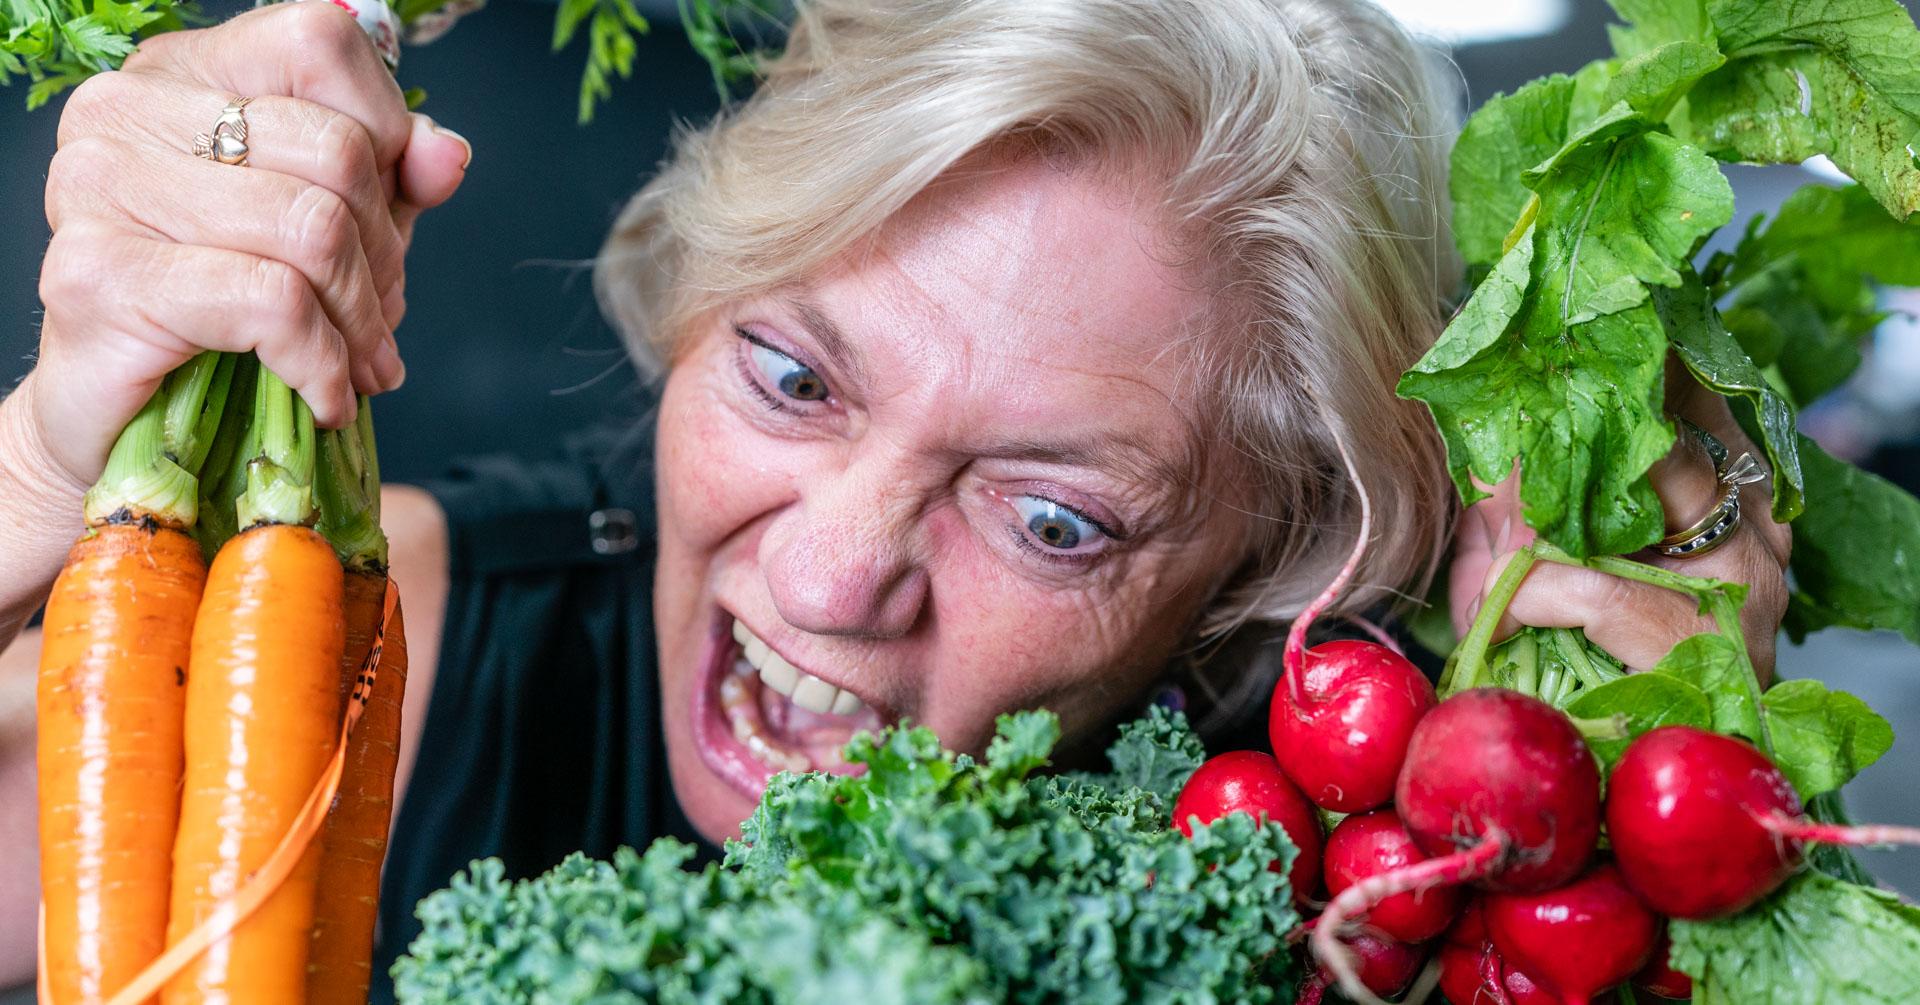 blog - cover photo - nutrition - prioritizing veggies - violet facebook ad-3 (1).jpg